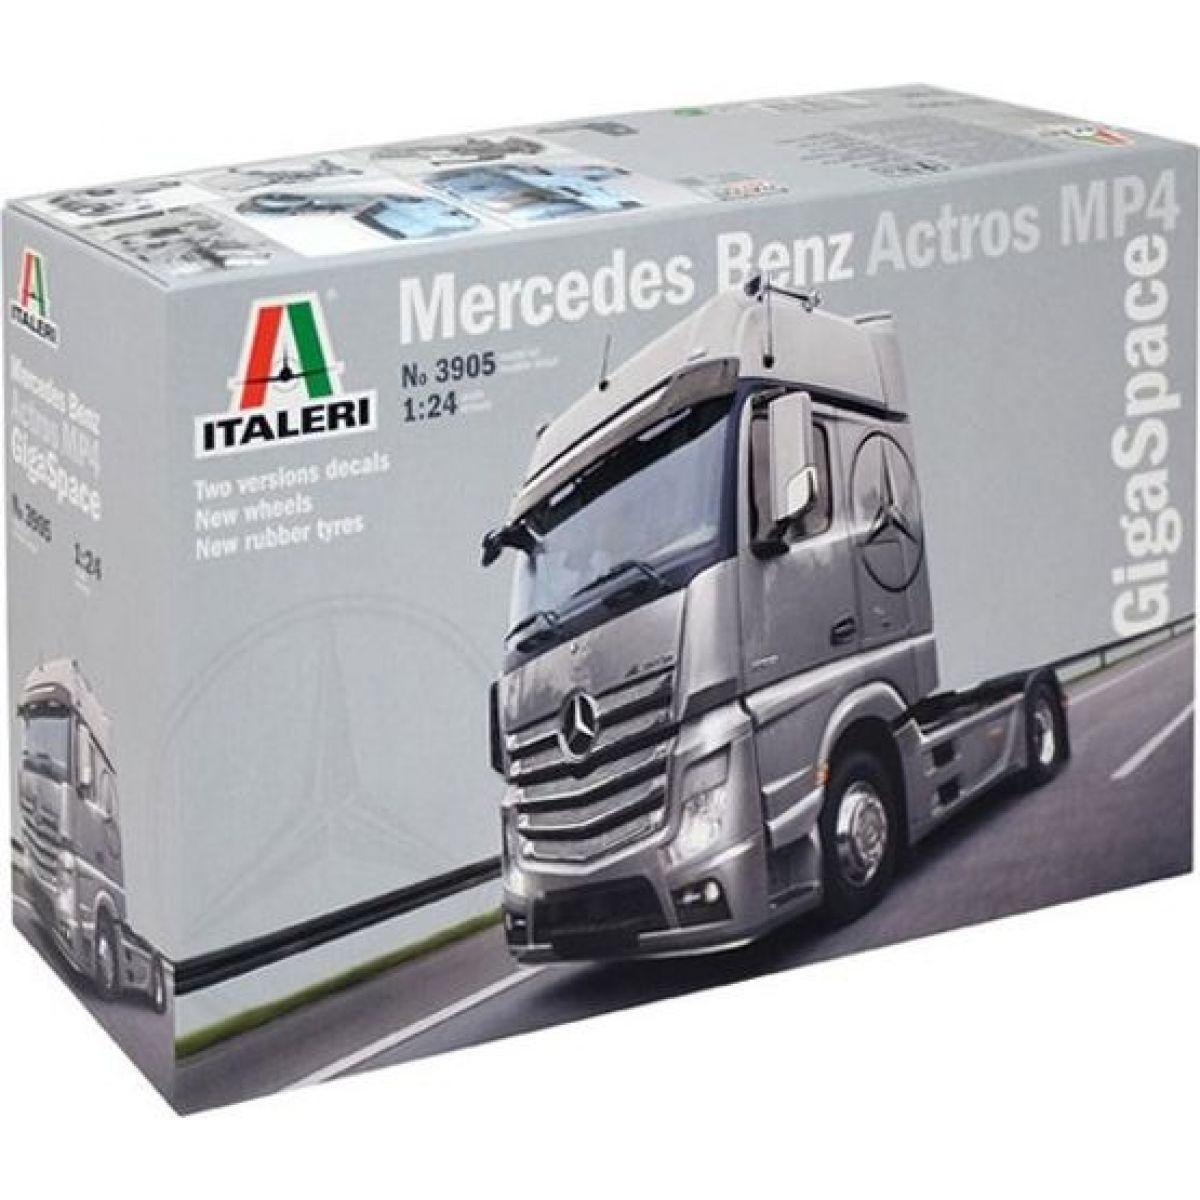 Italeri Model Kit truck 3905 Mercedes Benz Actros MP4 Gigaspace 1:24